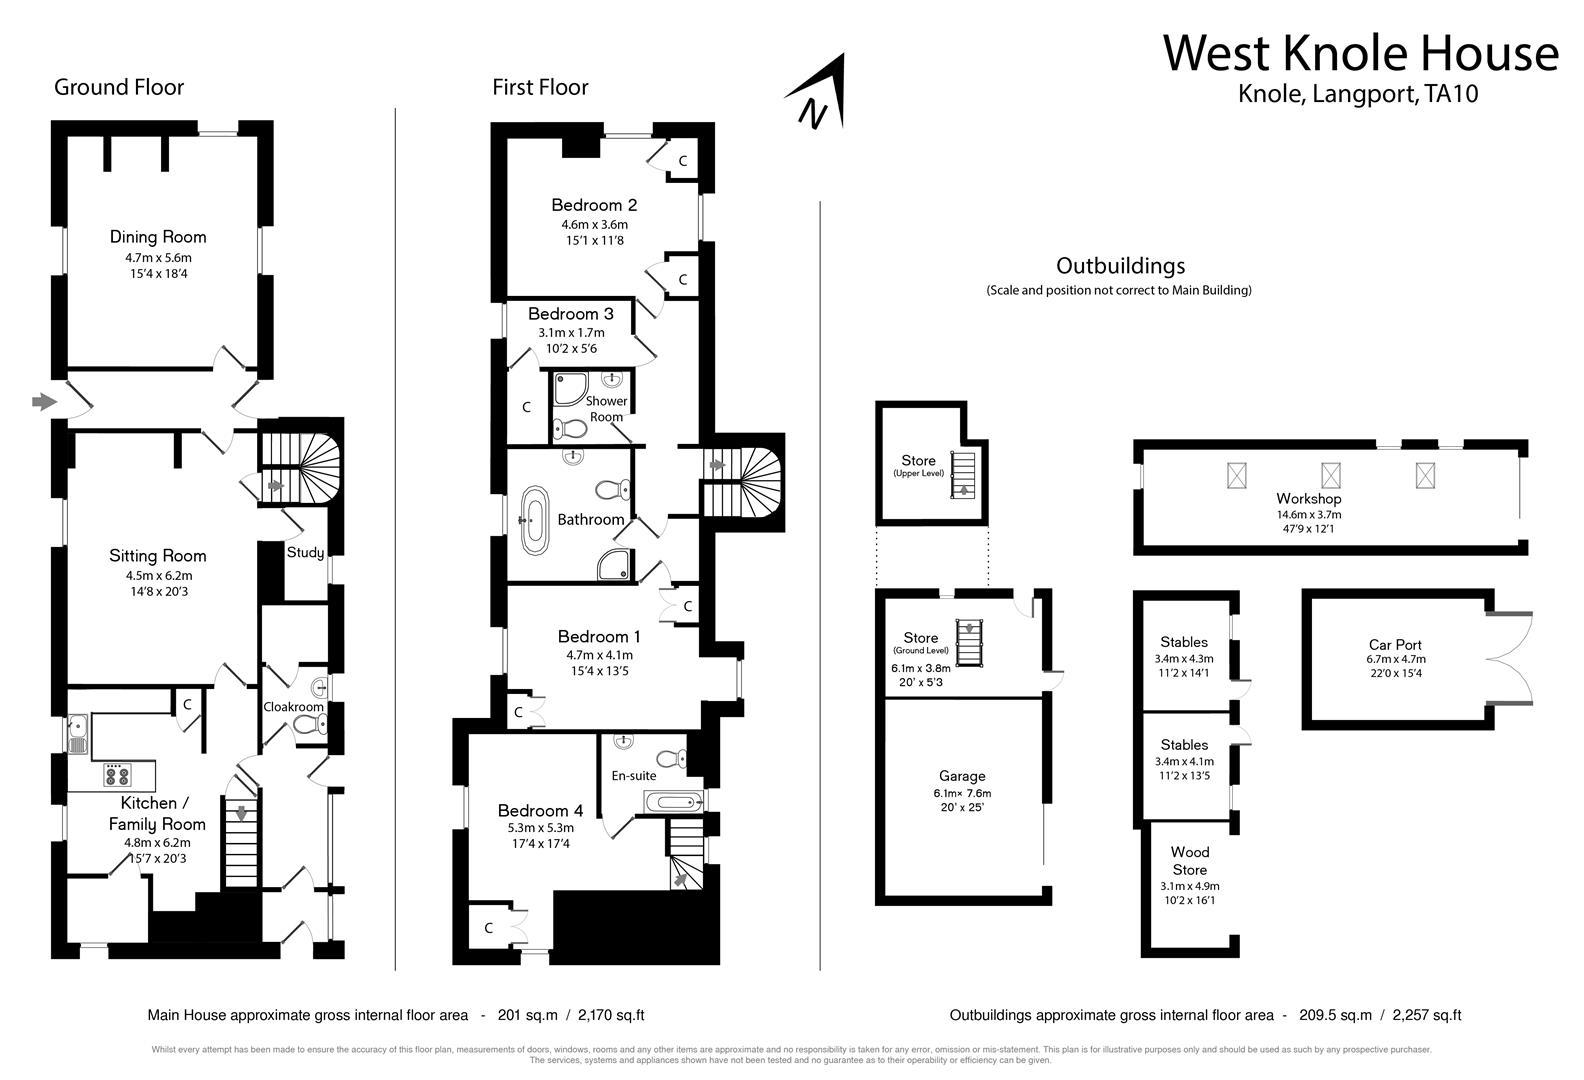 4 bedroom property for sale in knole langport 163 795 000 old westbury gardens floor plan best home design and